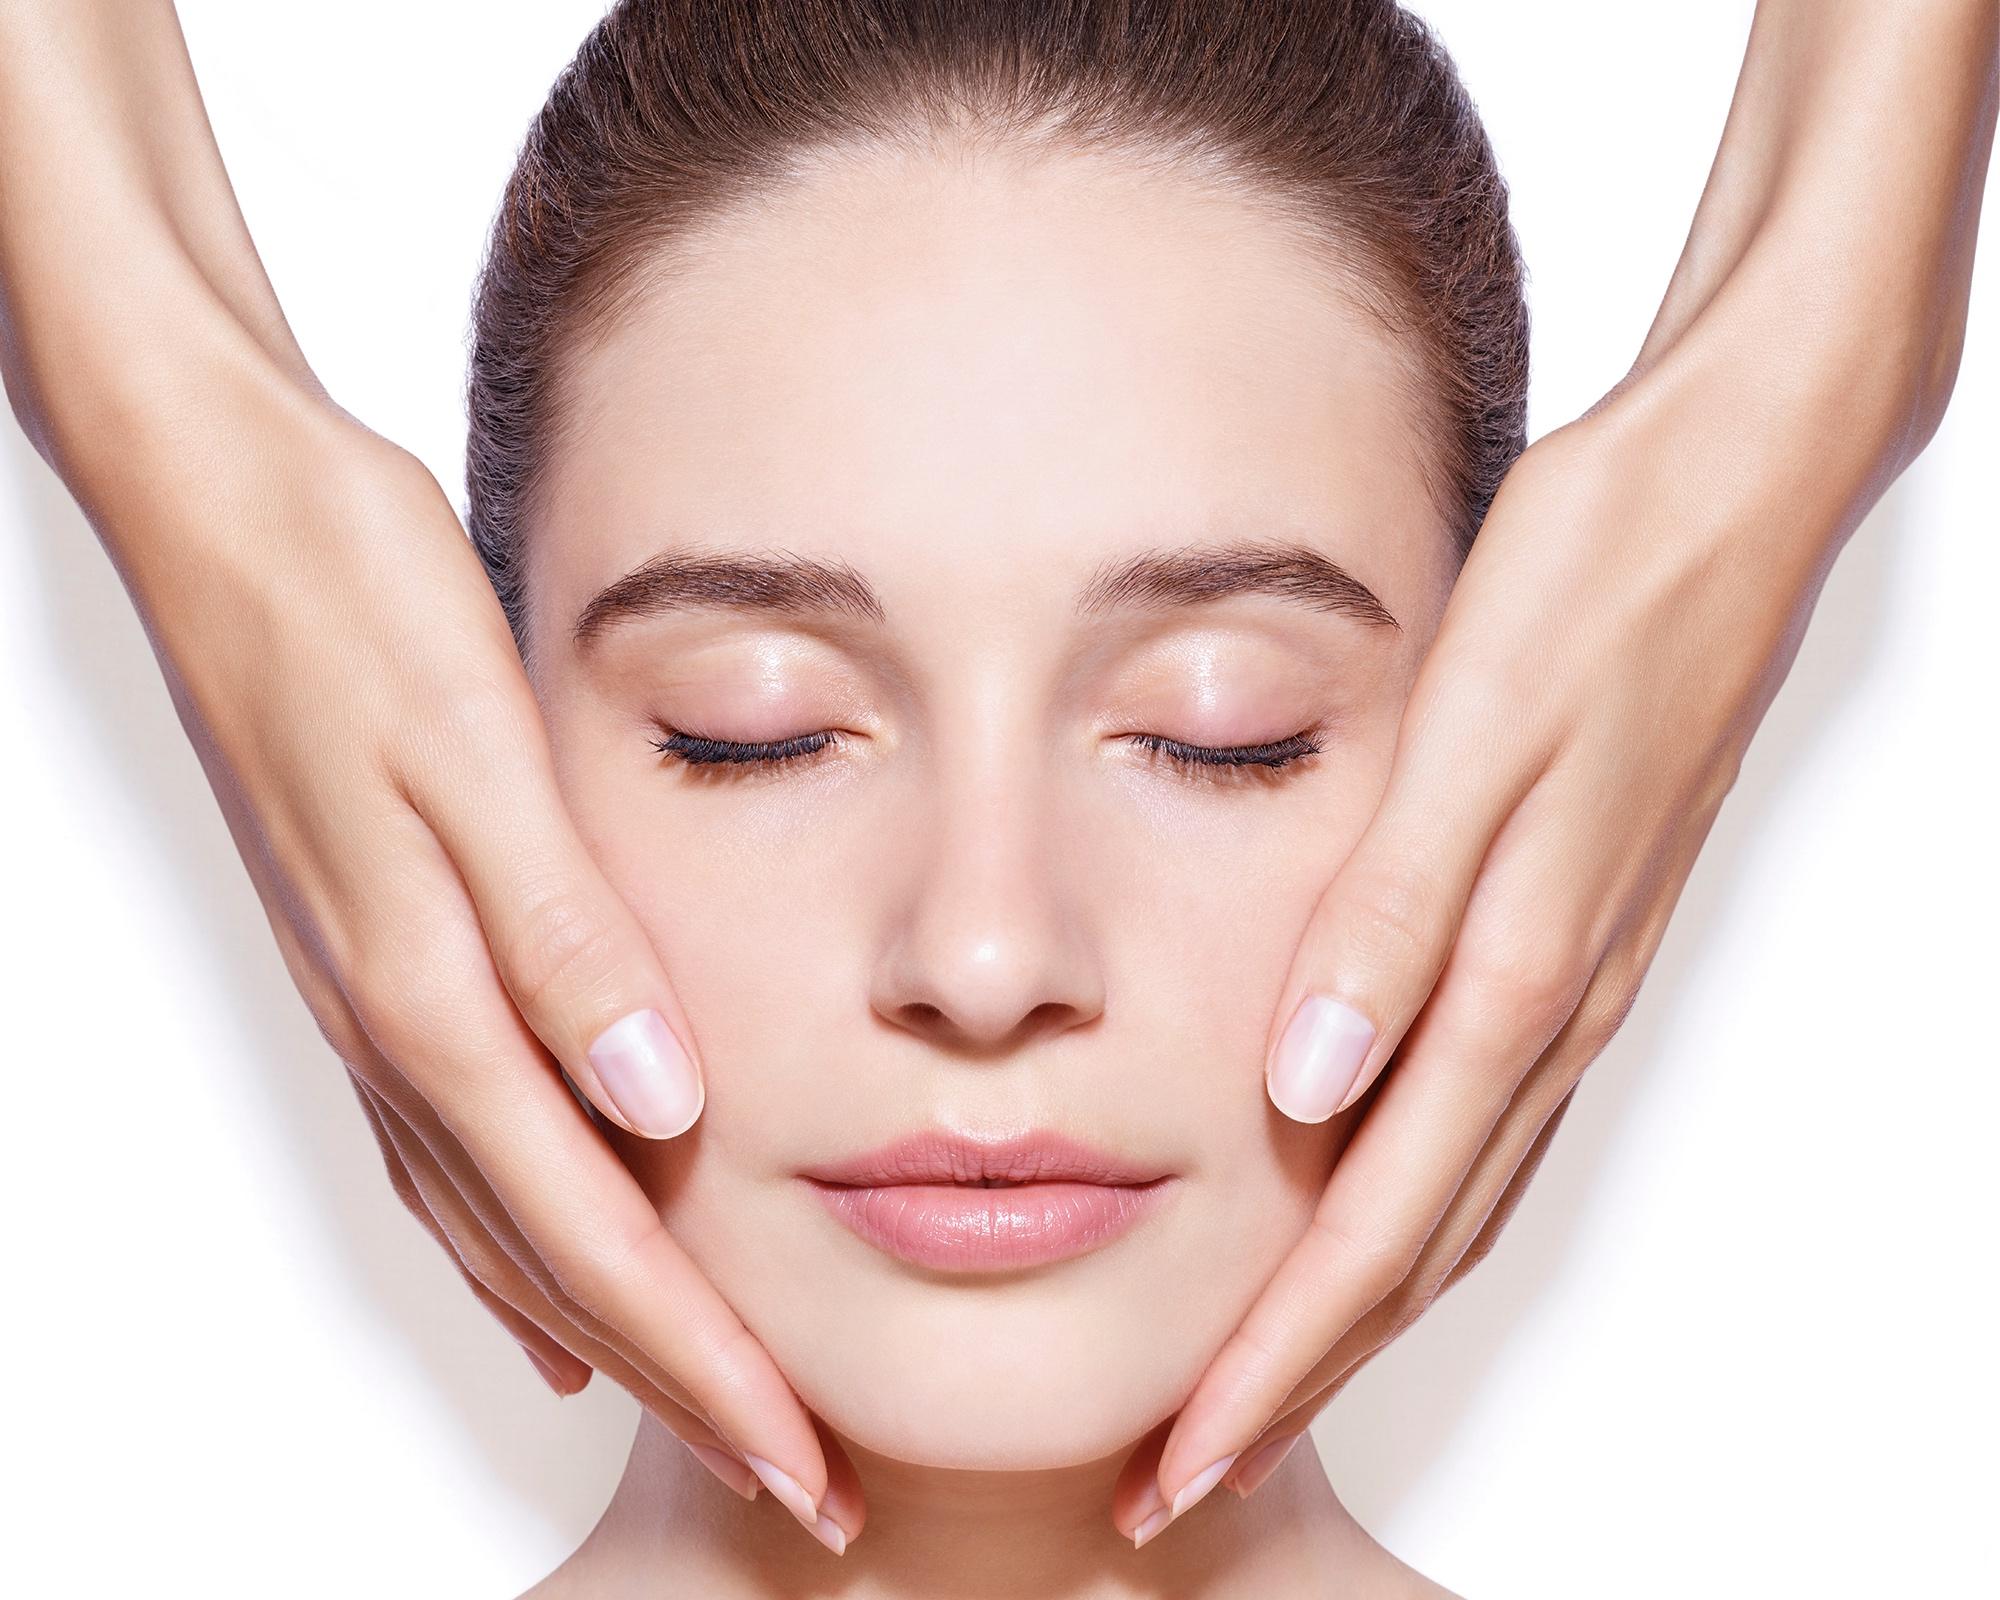 Pimple Acne Deep Cleansing Treatmentjpg